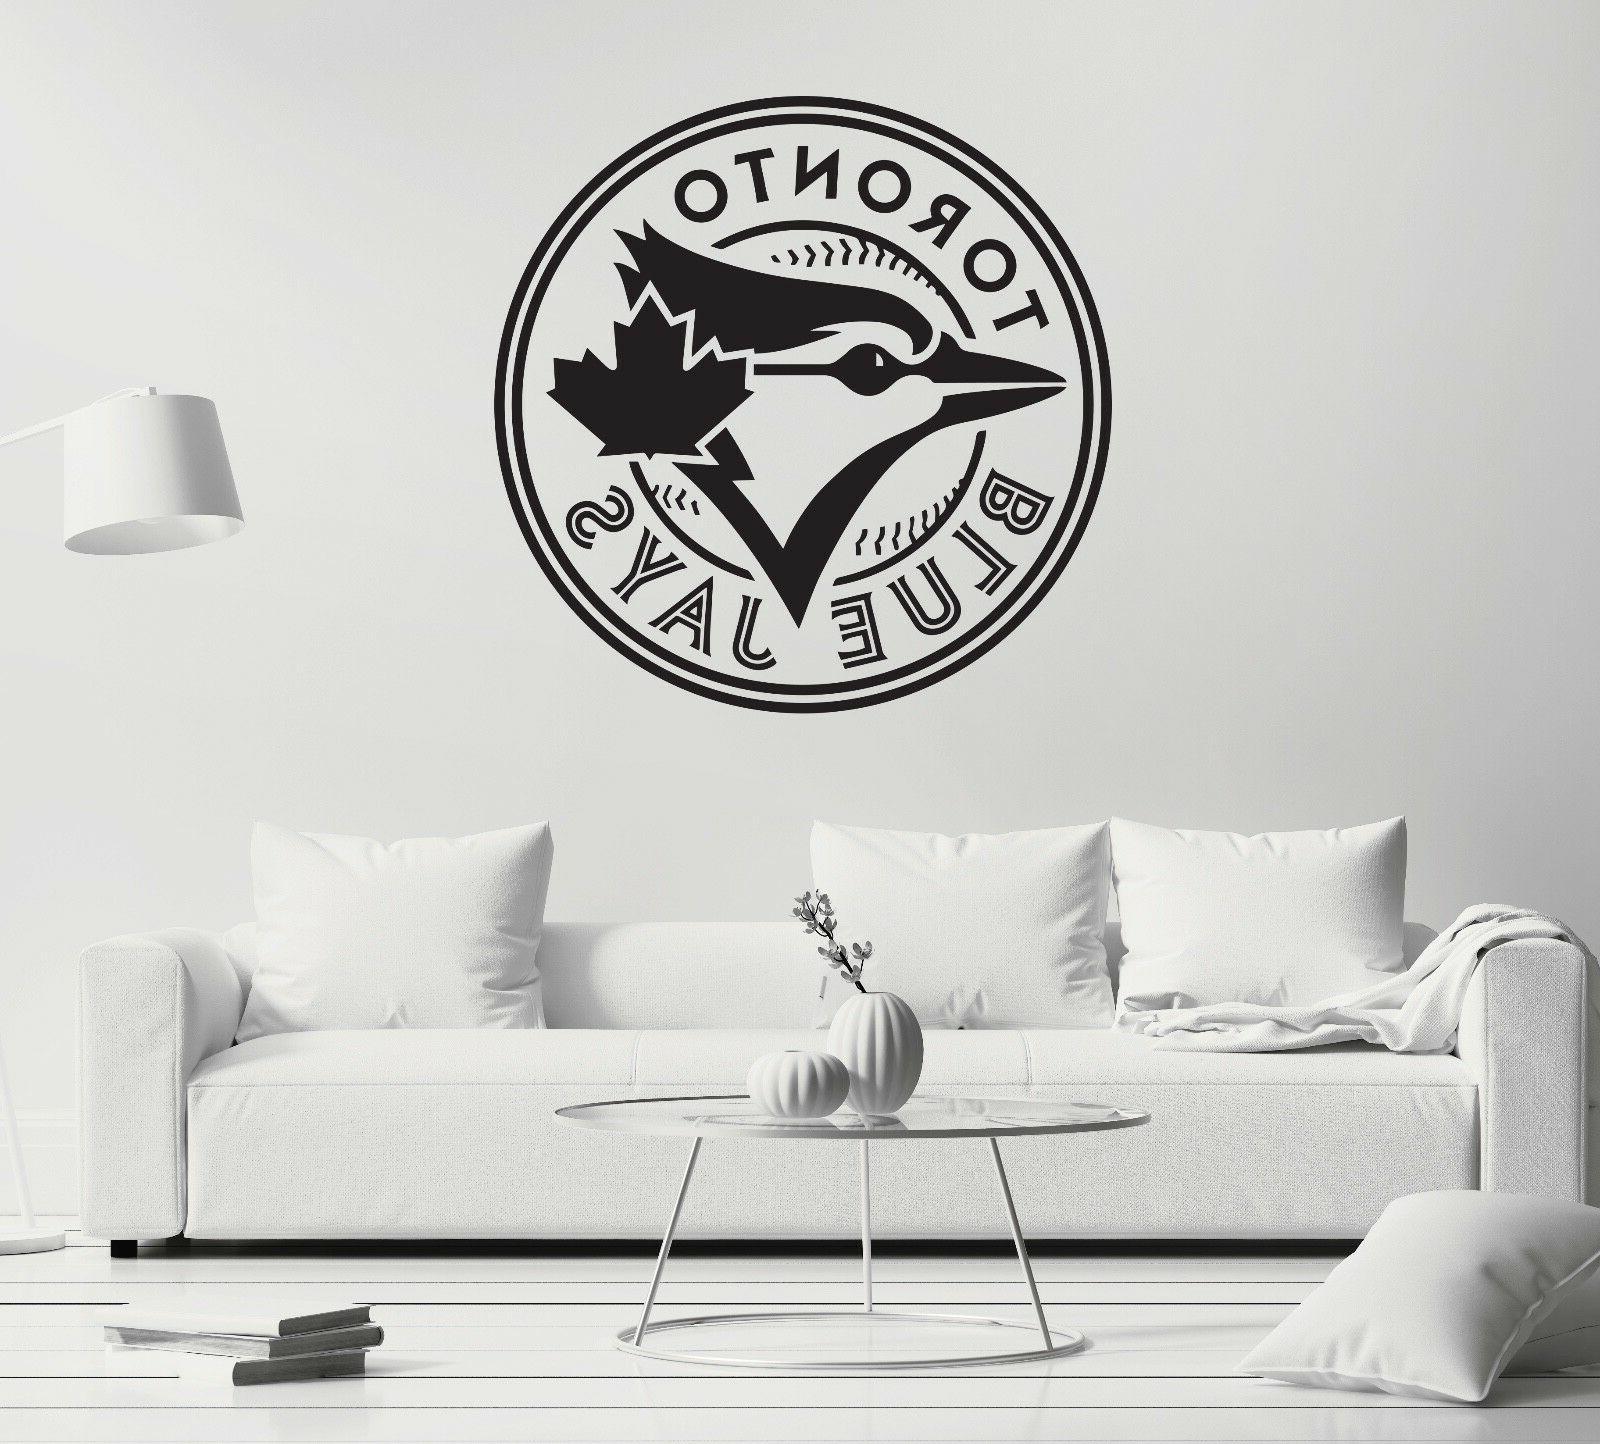 Toronto Wall Sticker Black Vinyl CG493